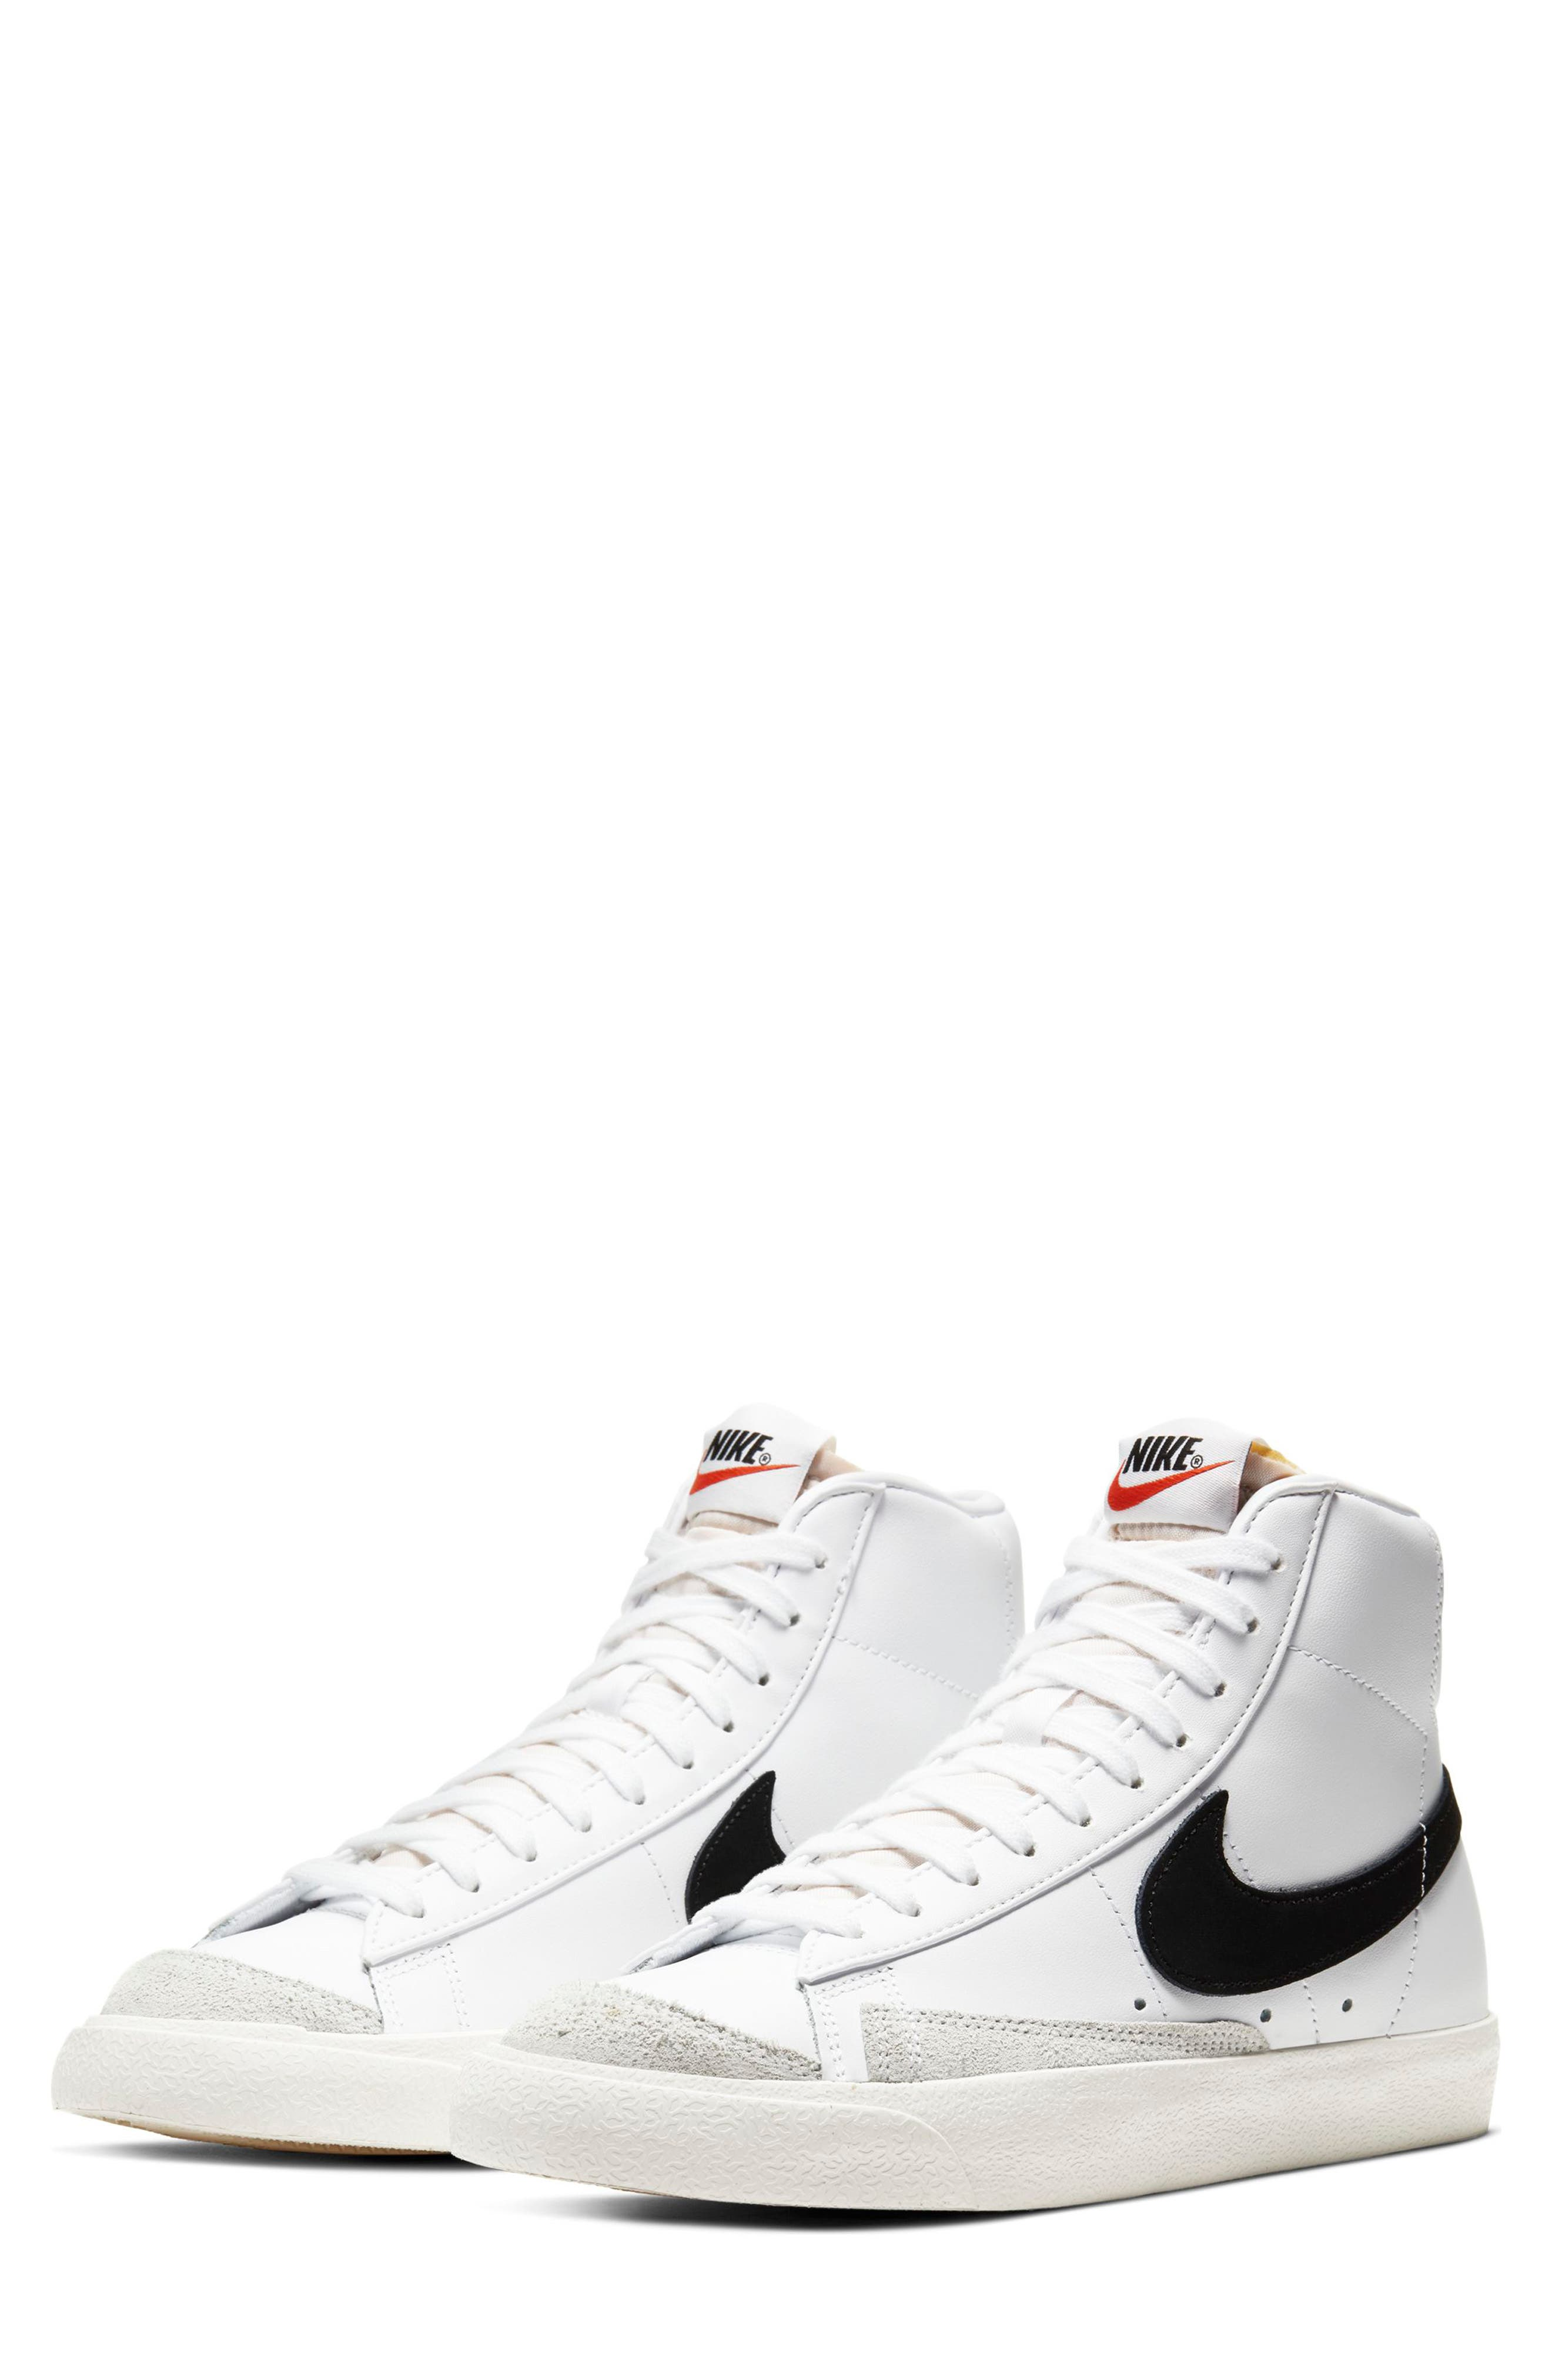 nike women's blazer high top sneakers